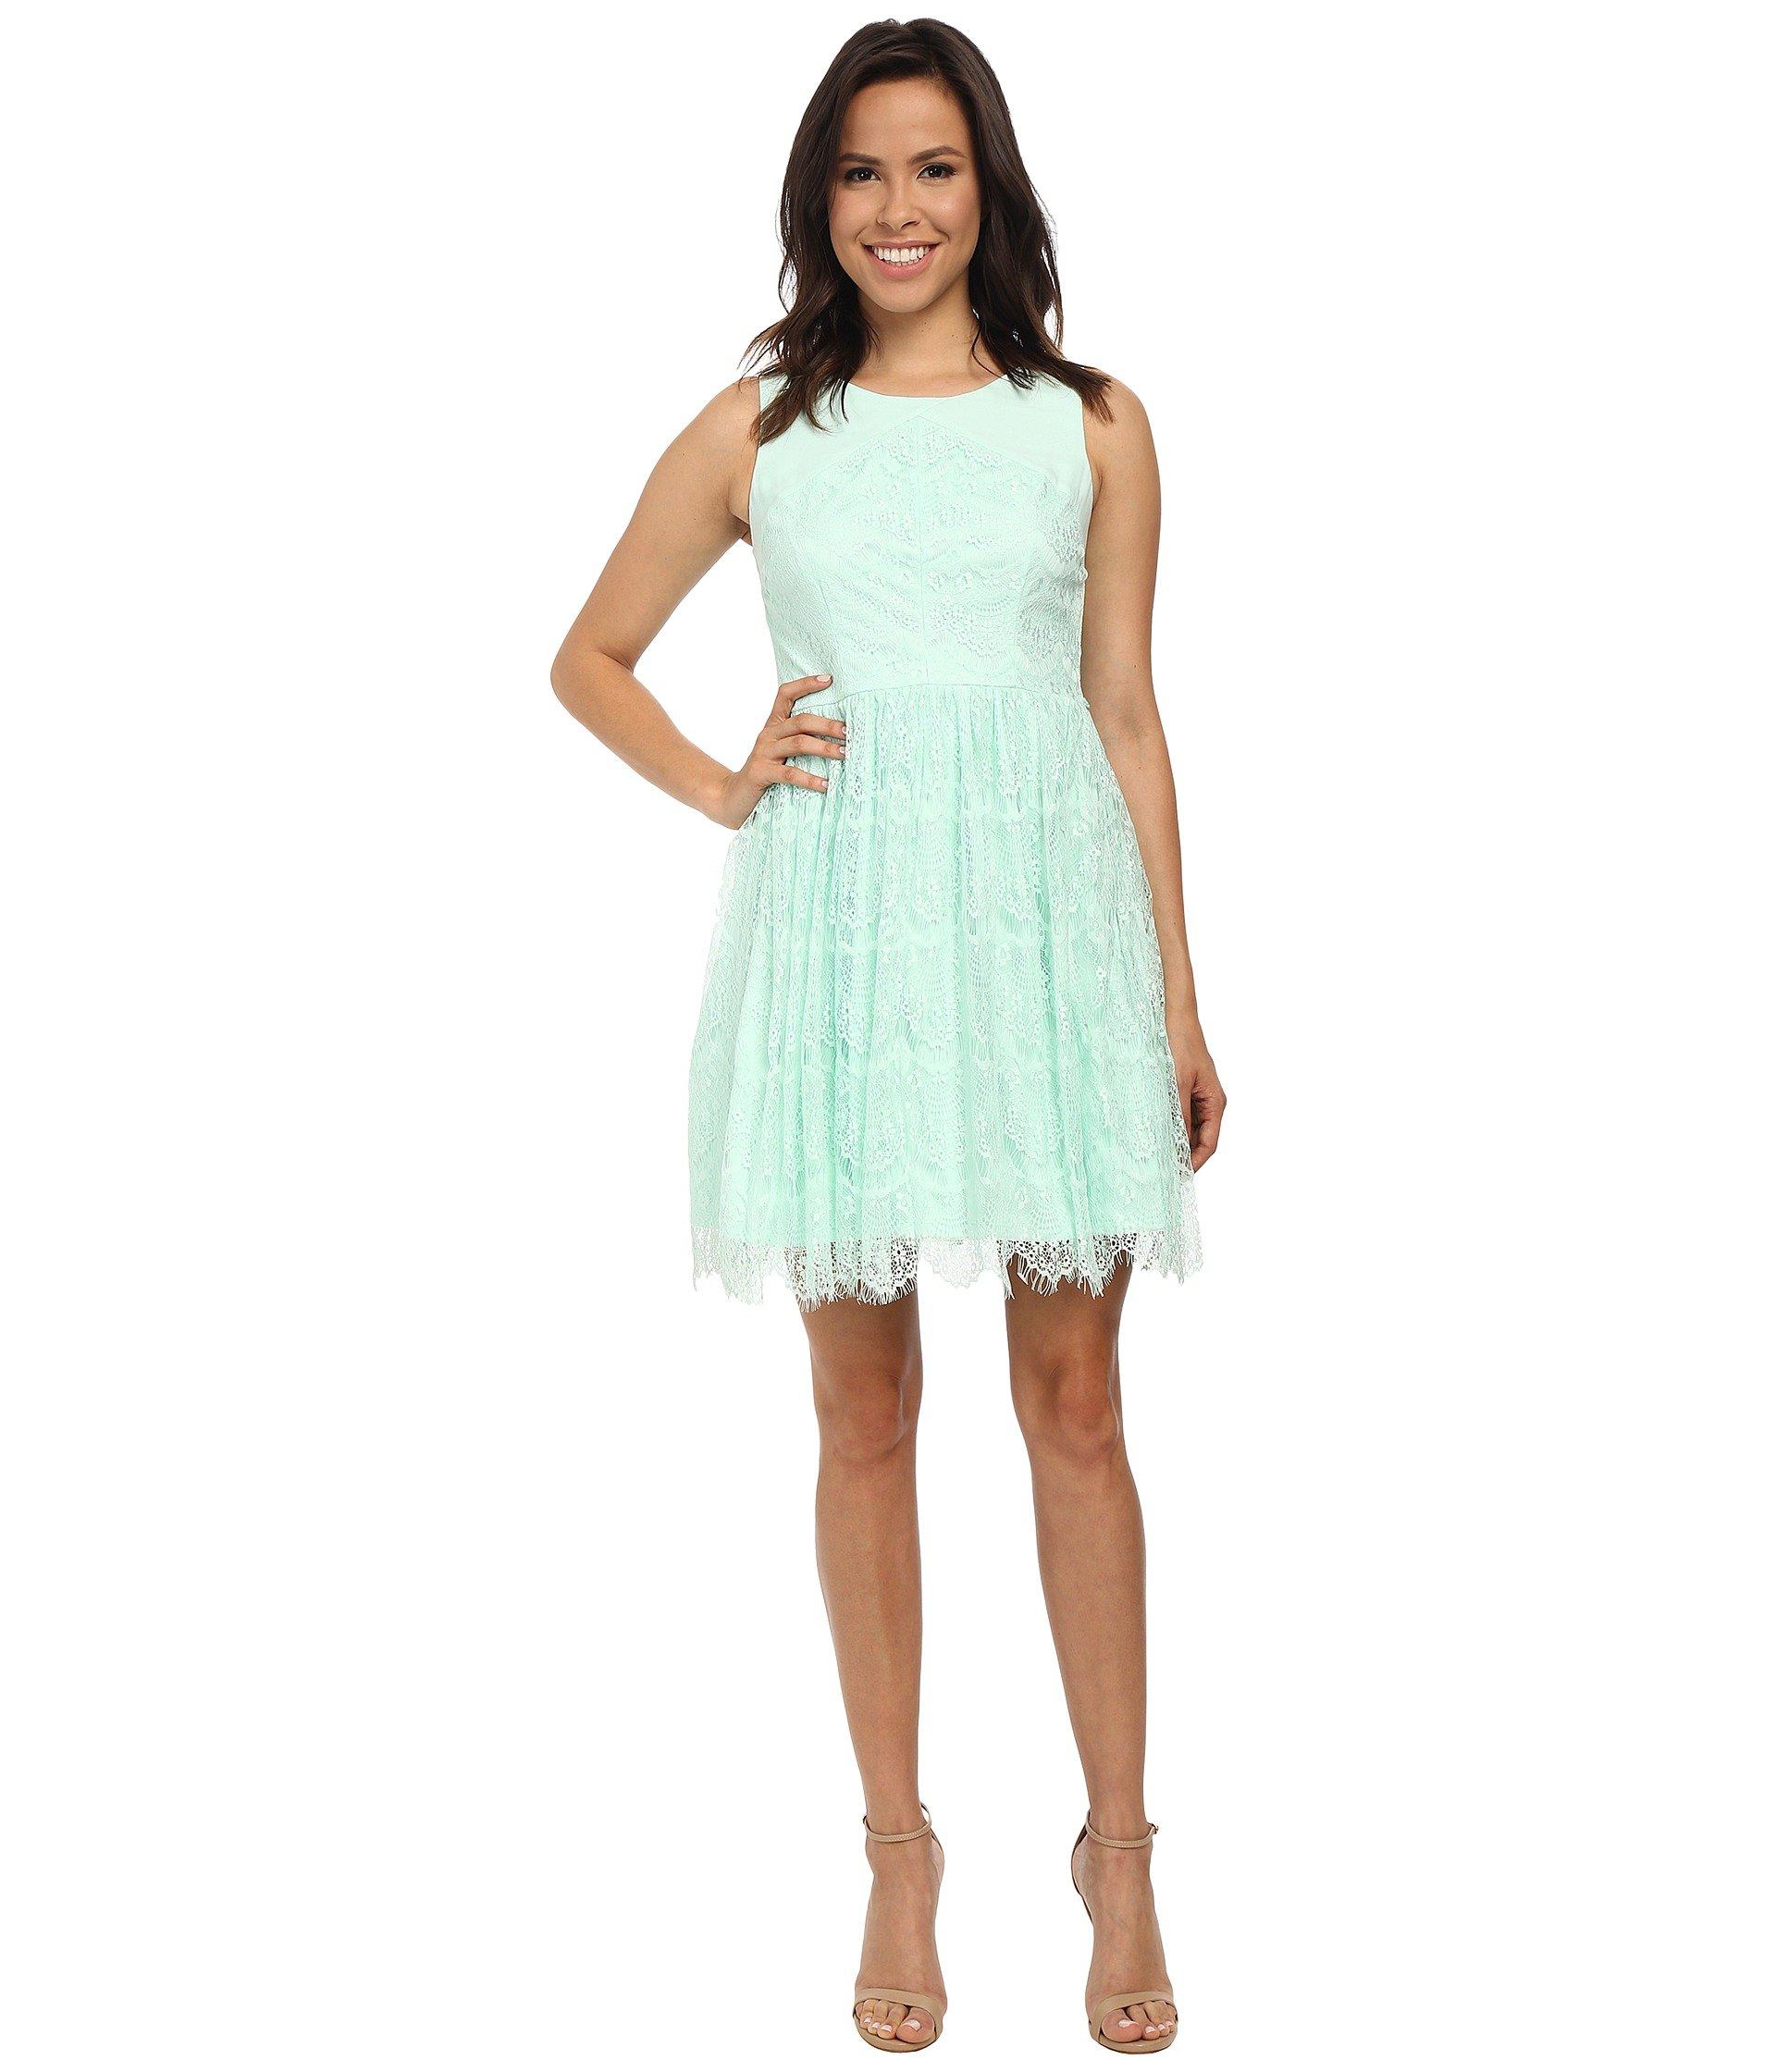 2b17c00800 Jessica Simpson Sleeveless Lace Dress in Green - Lyst